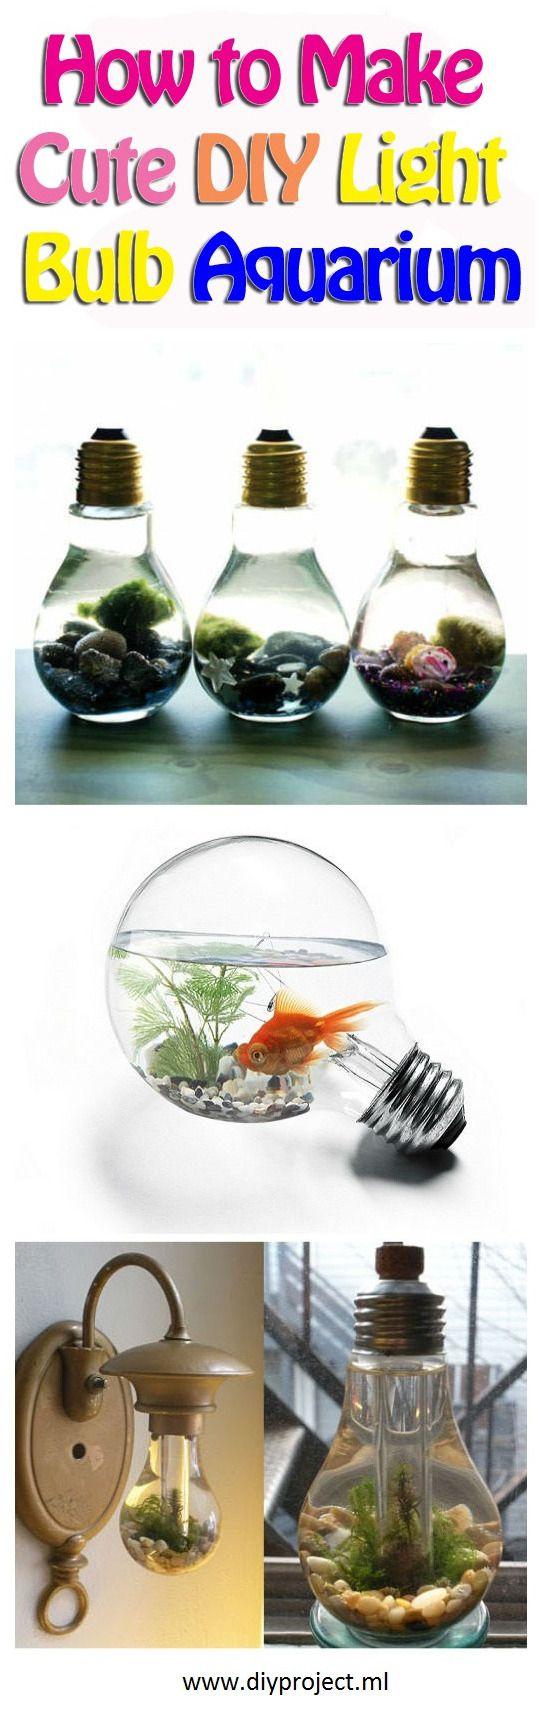 how to make cute diy light bulb aquarium diy fun pinterest bulbs diy light and how to make. Black Bedroom Furniture Sets. Home Design Ideas